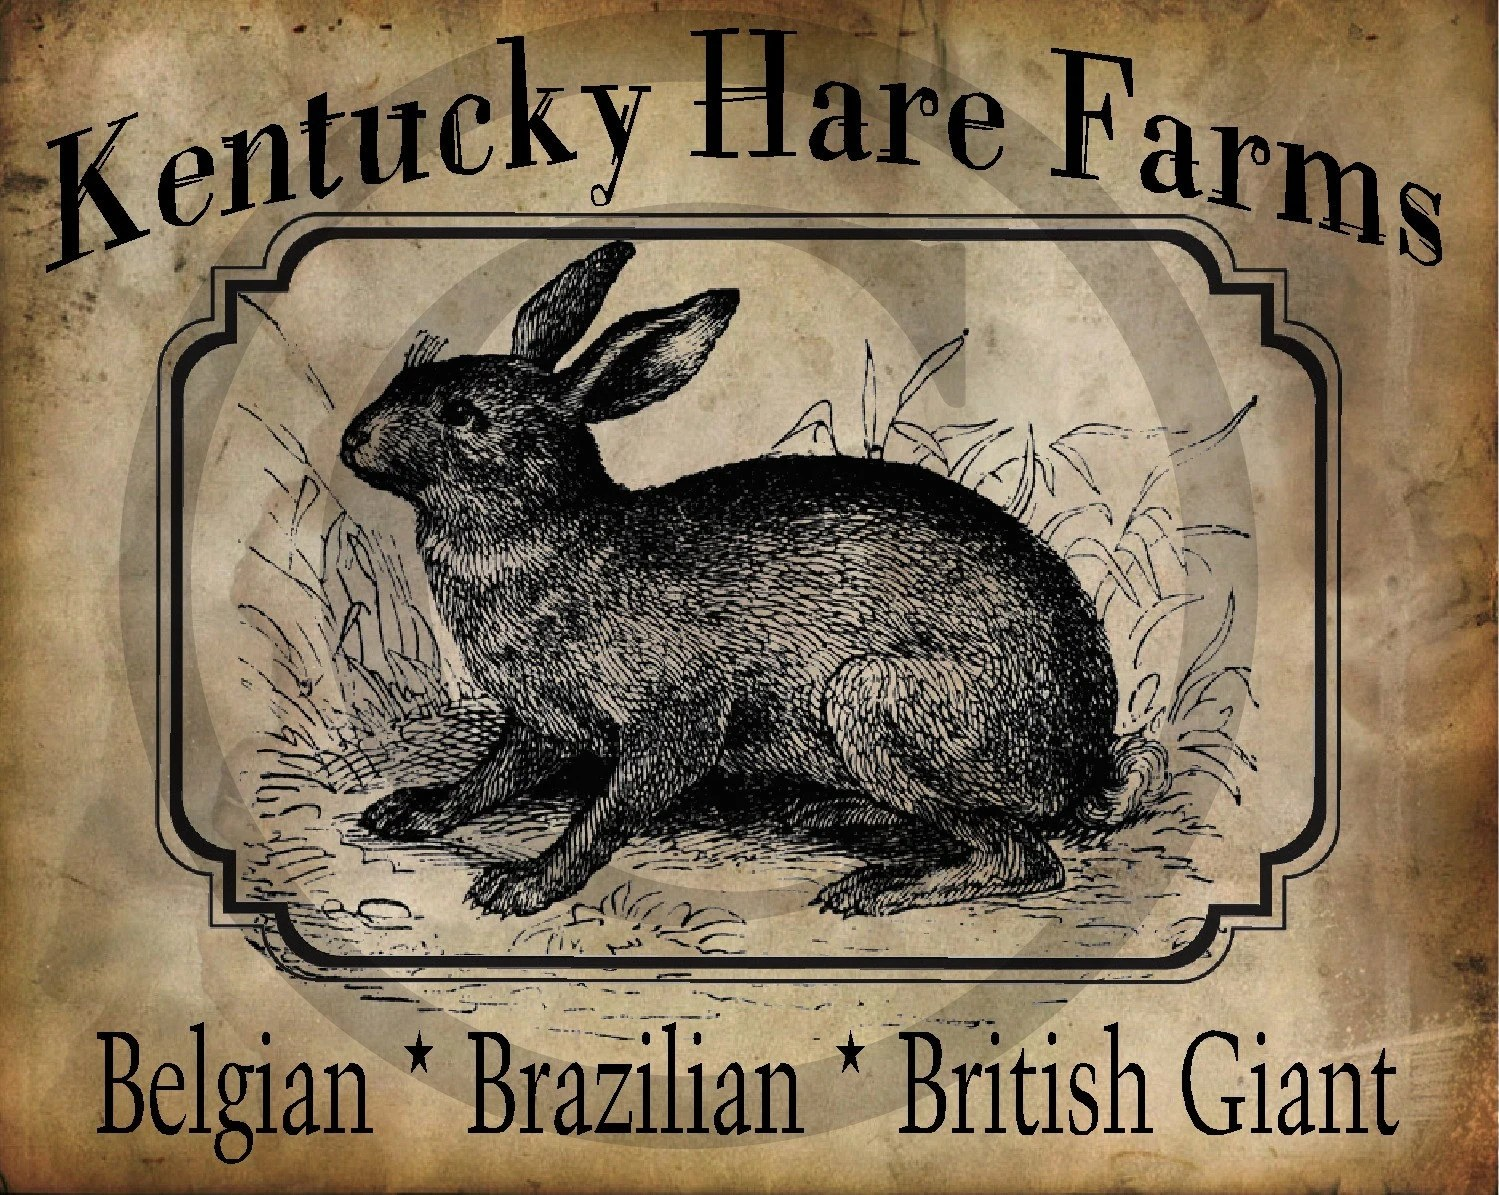 Primitive Kentucky Hare Farms Bunny Rabbit Print Digital